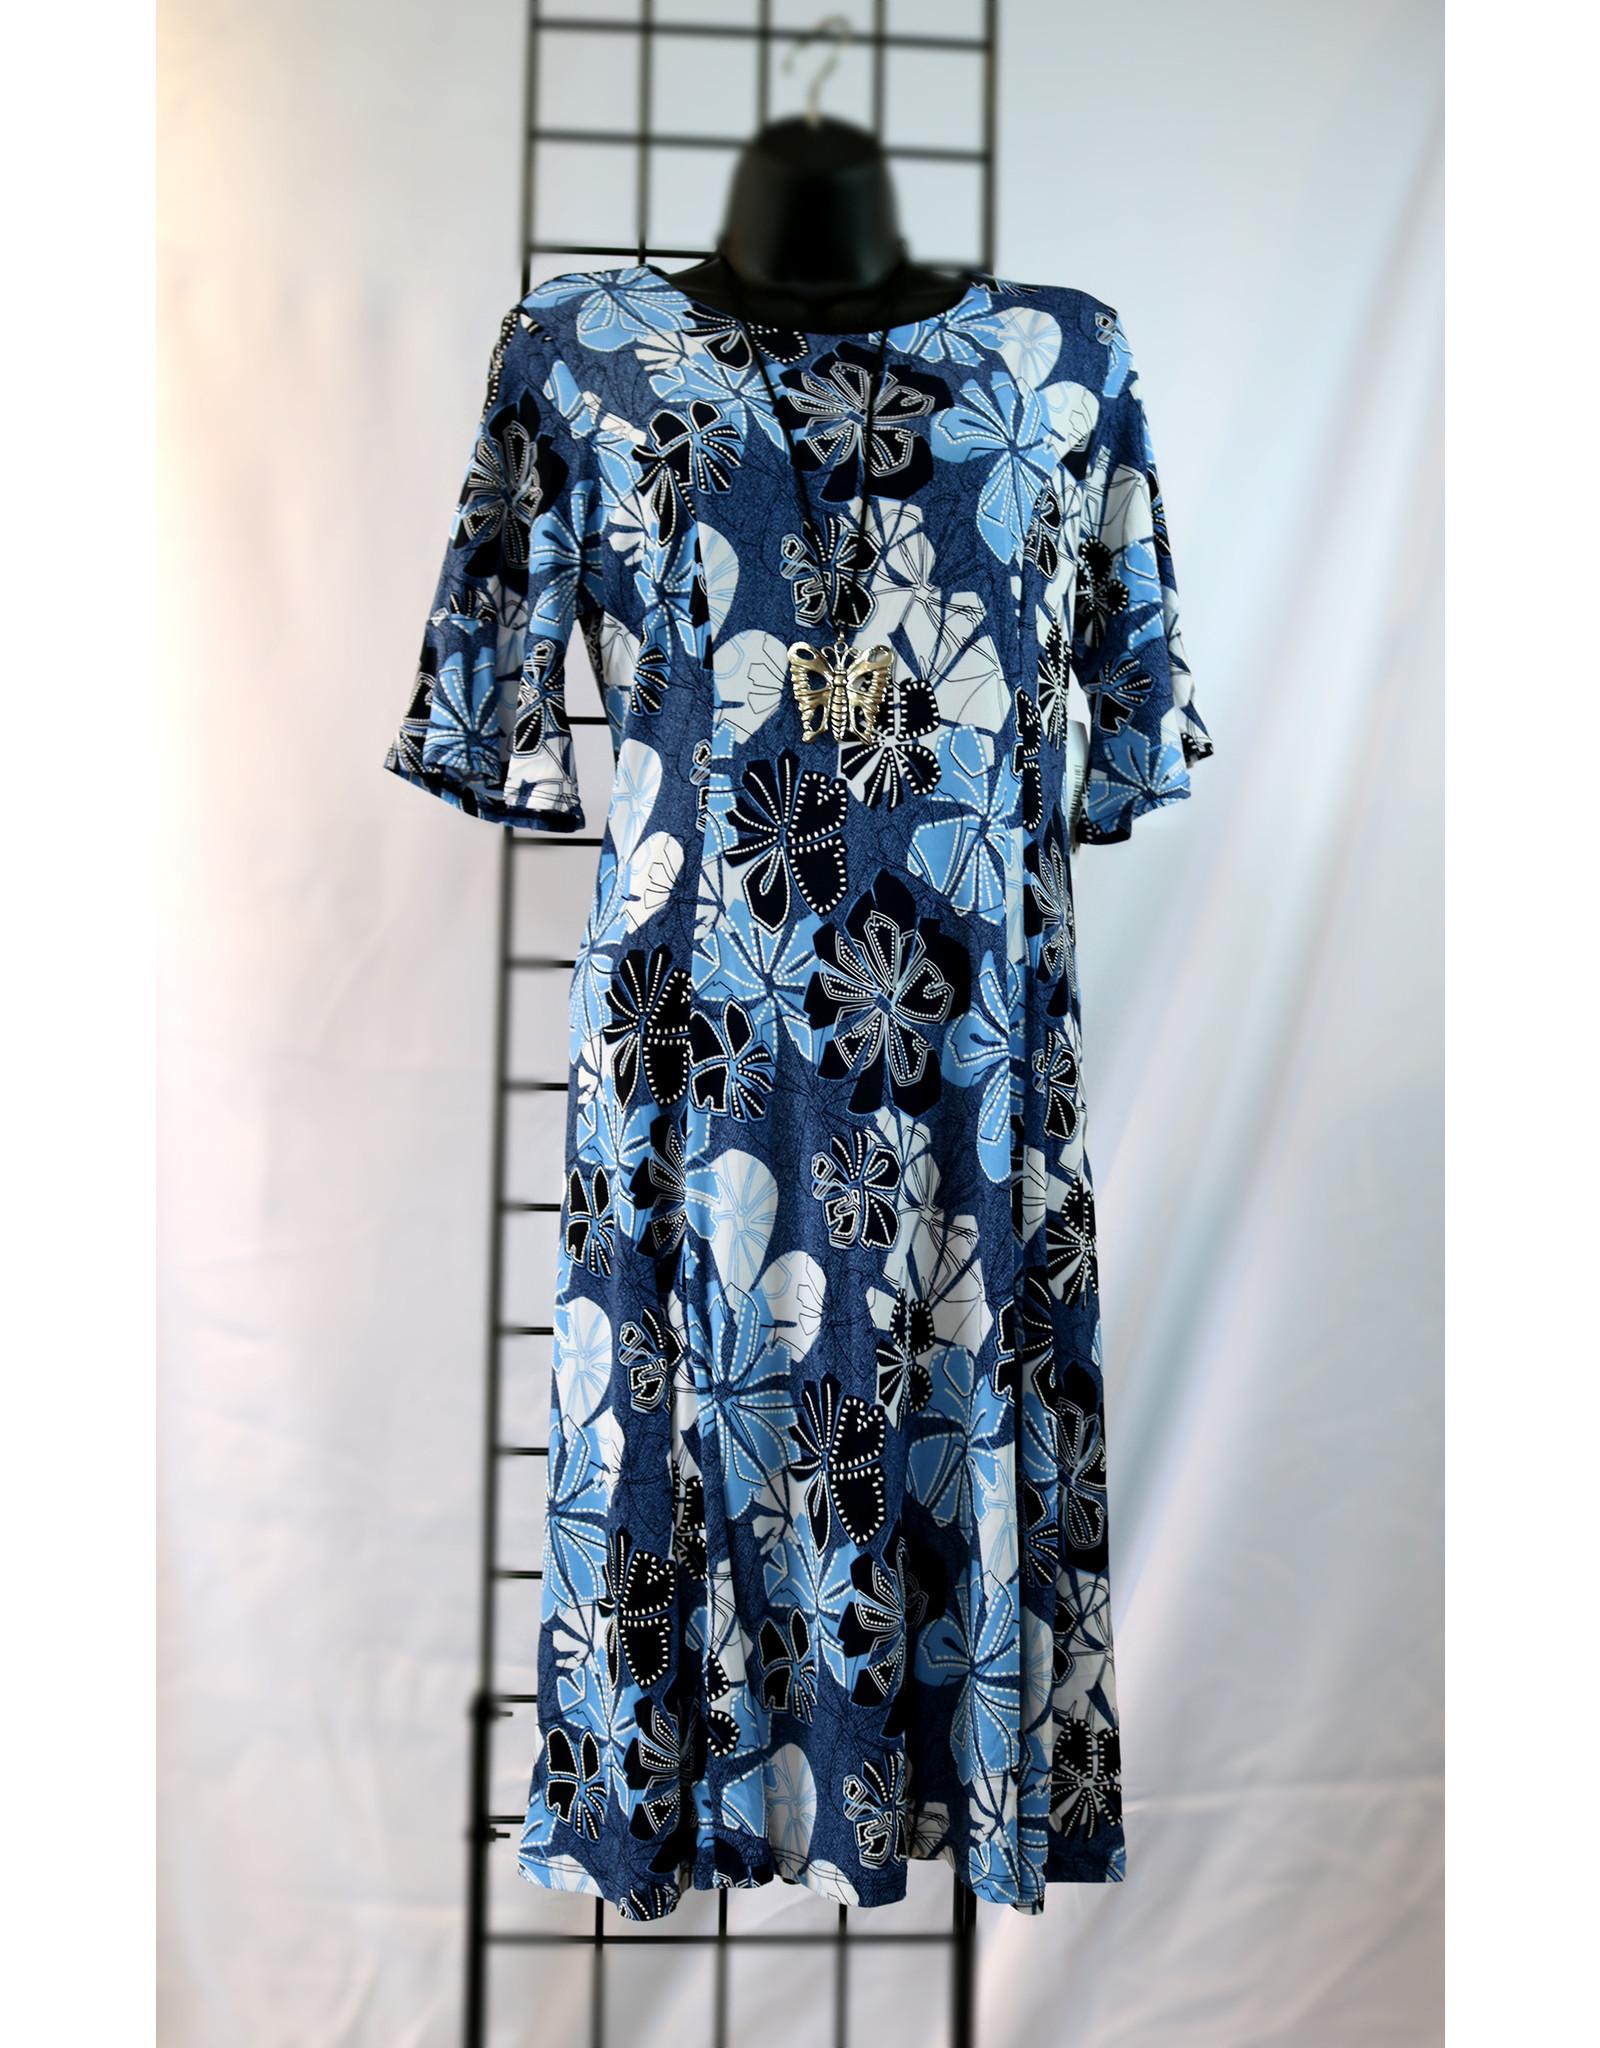 Southern Lady Elbow Sleeve Loretta Print Dress 6160160